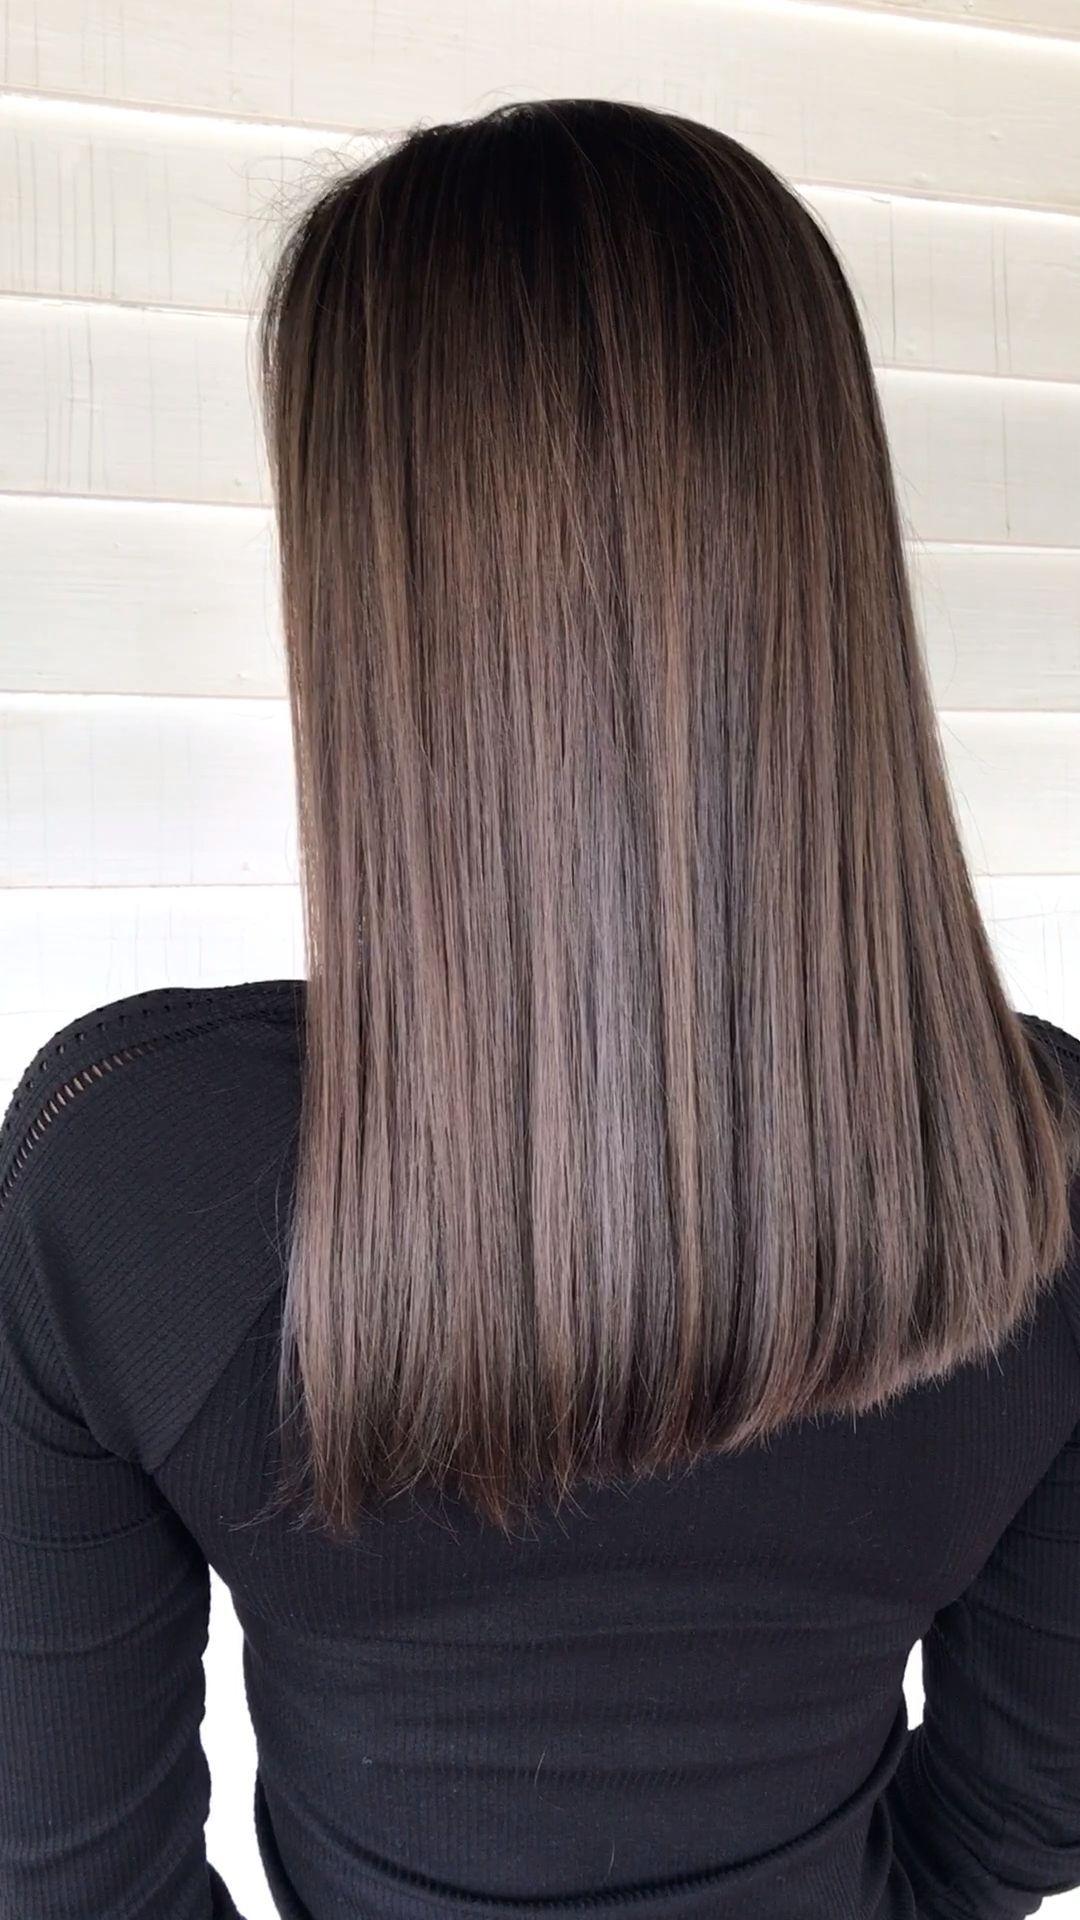 MUSHROOM BROWN ON DARK ASIAN HAIR